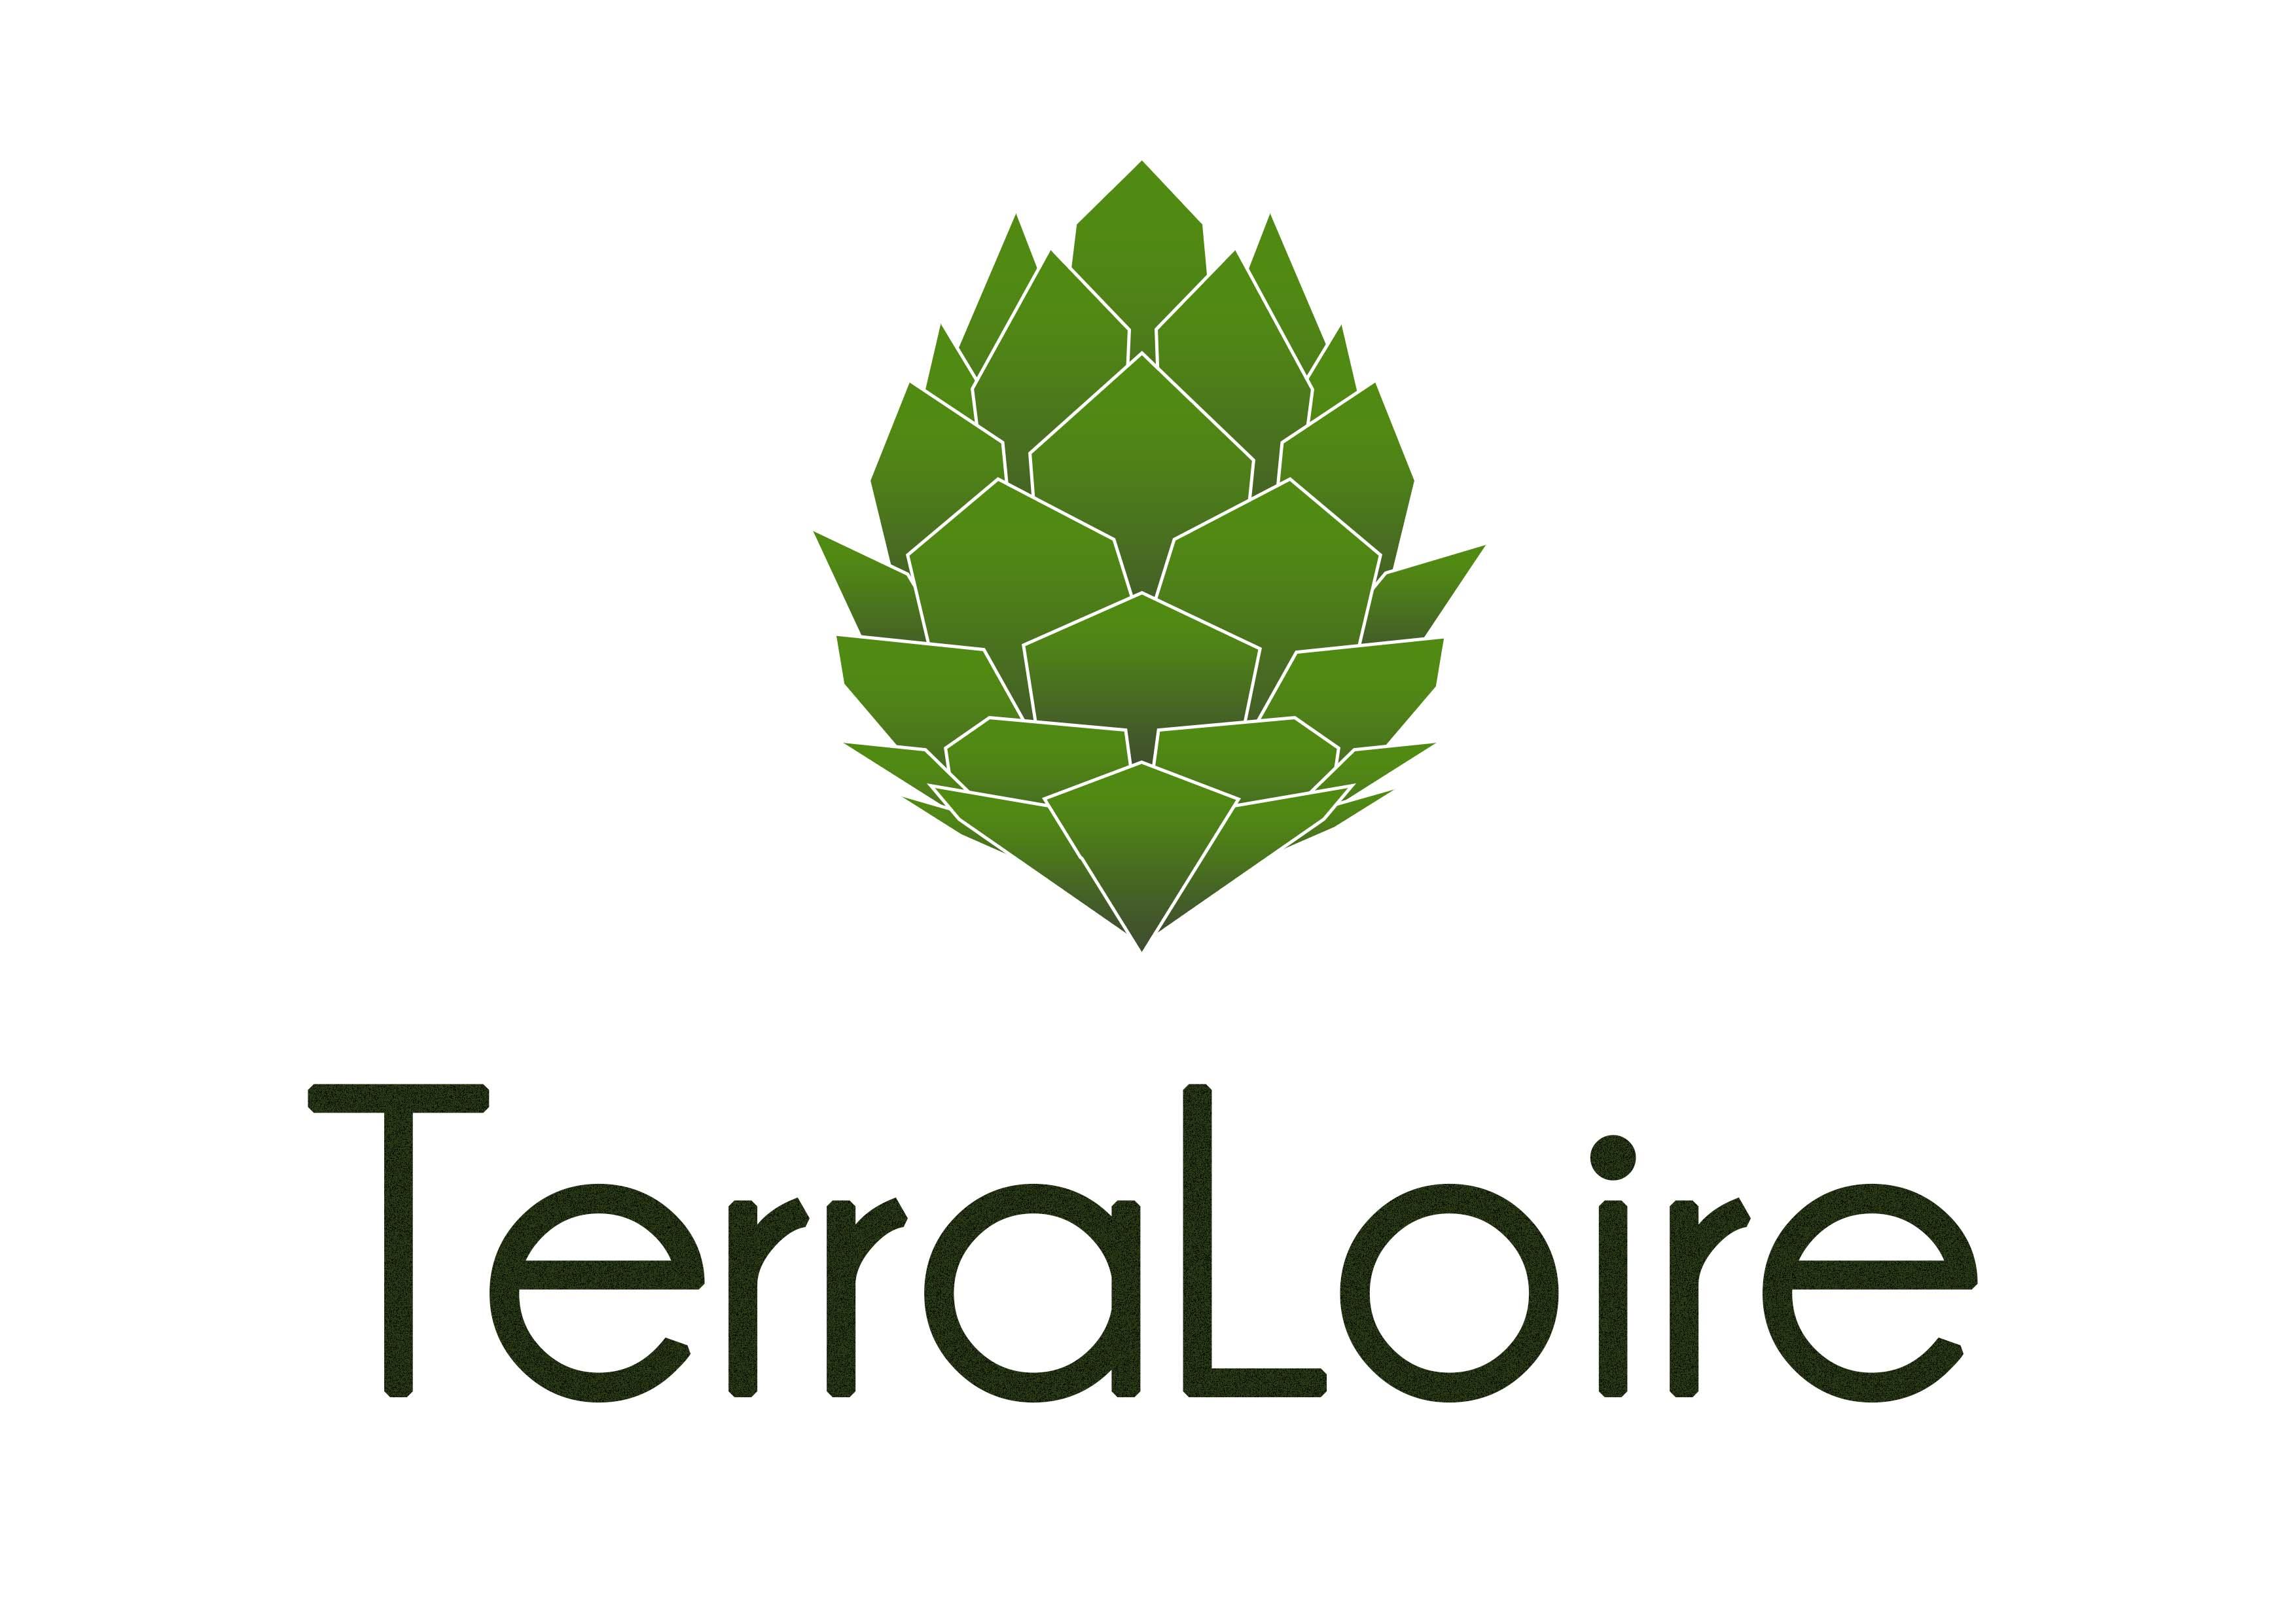 logo terraloire blanc